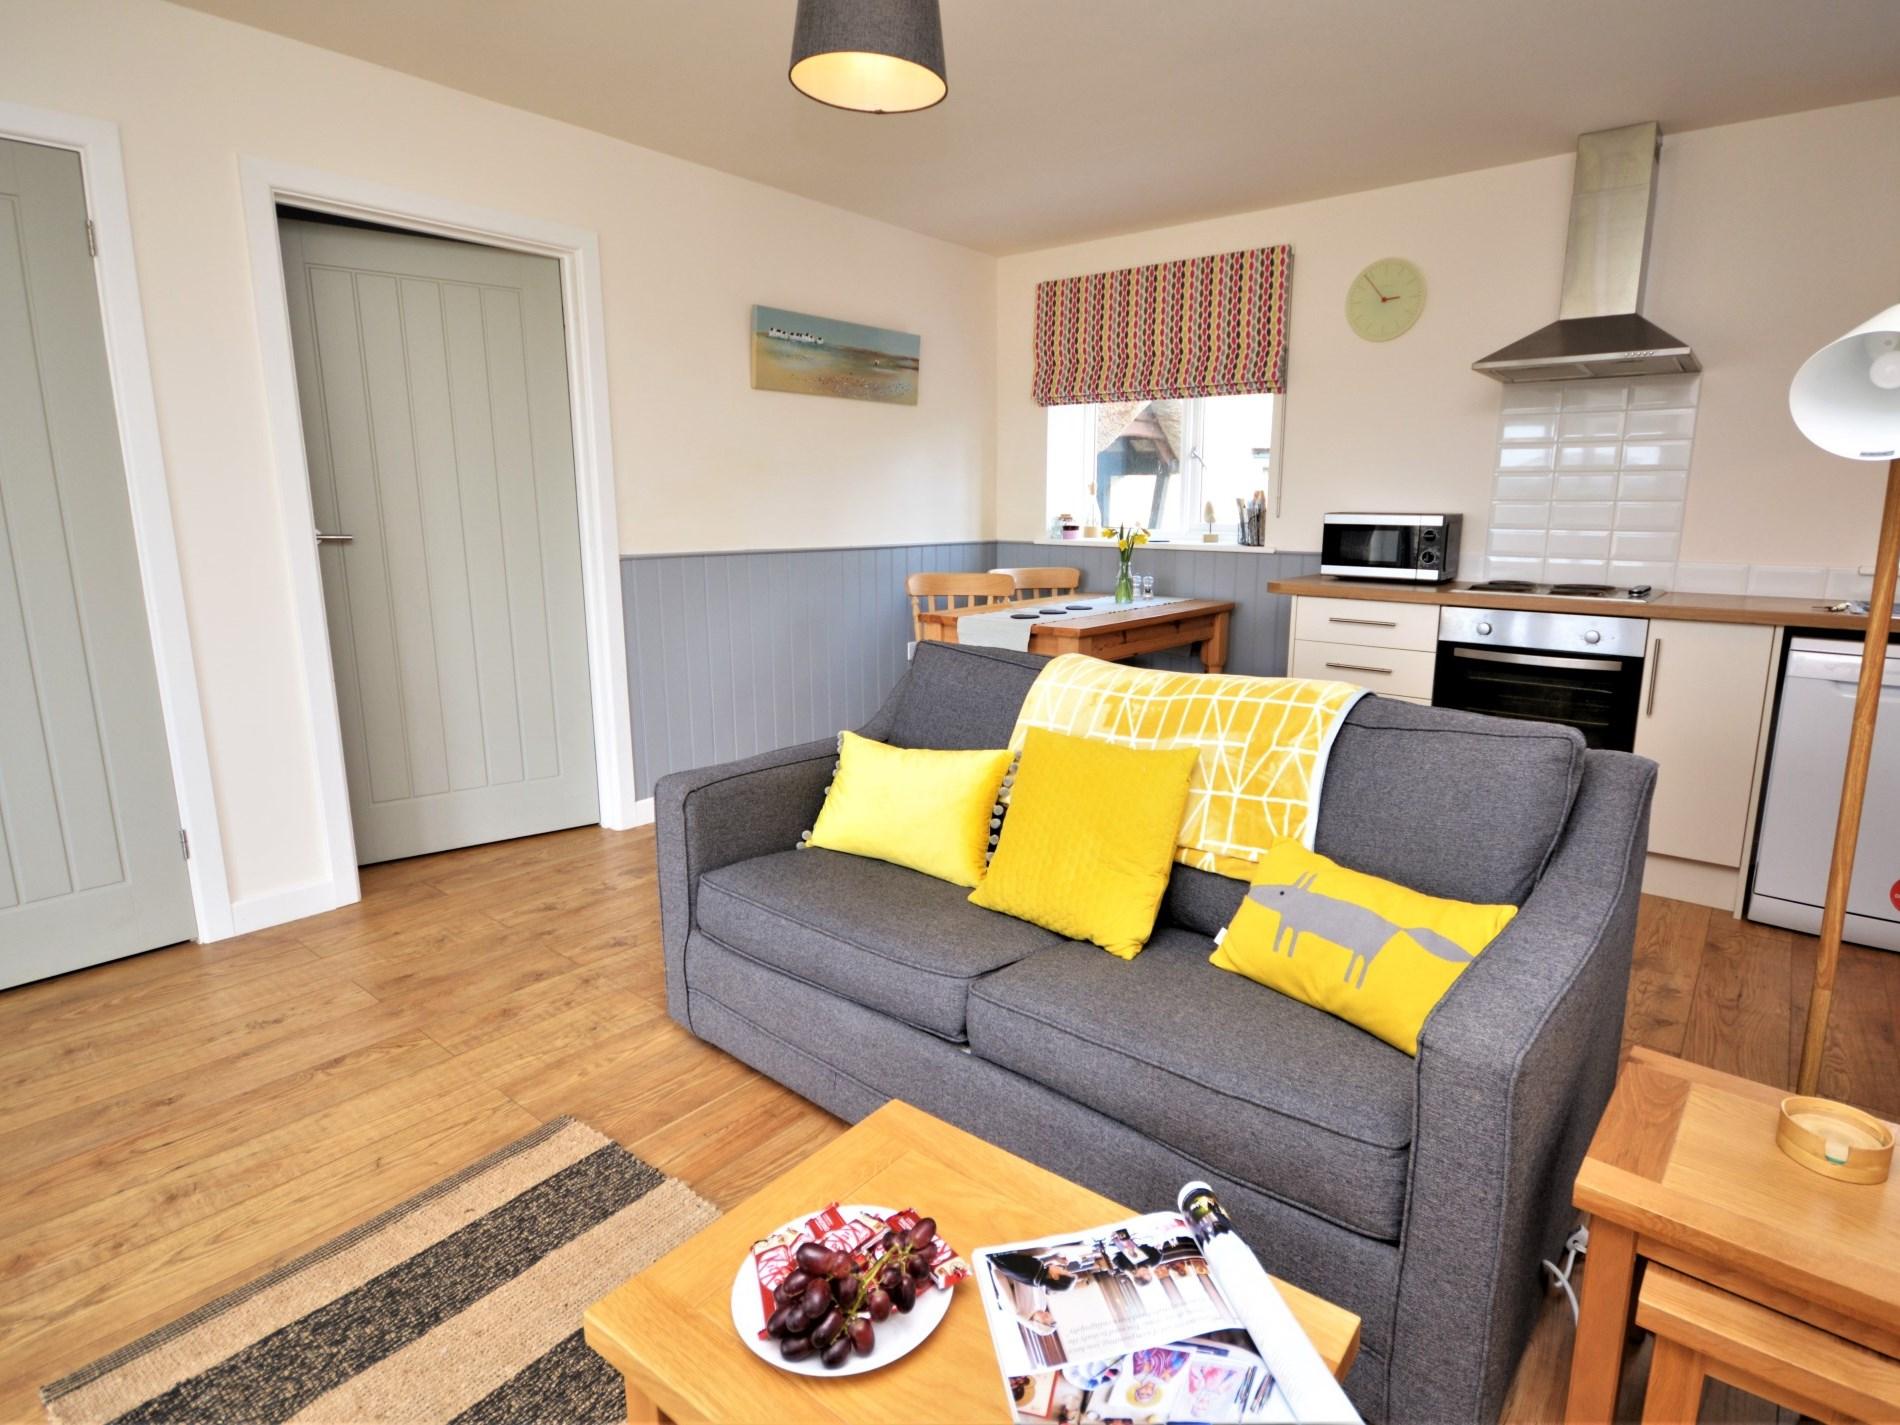 1 Bedroom Cottage in Winkleigh, Devon